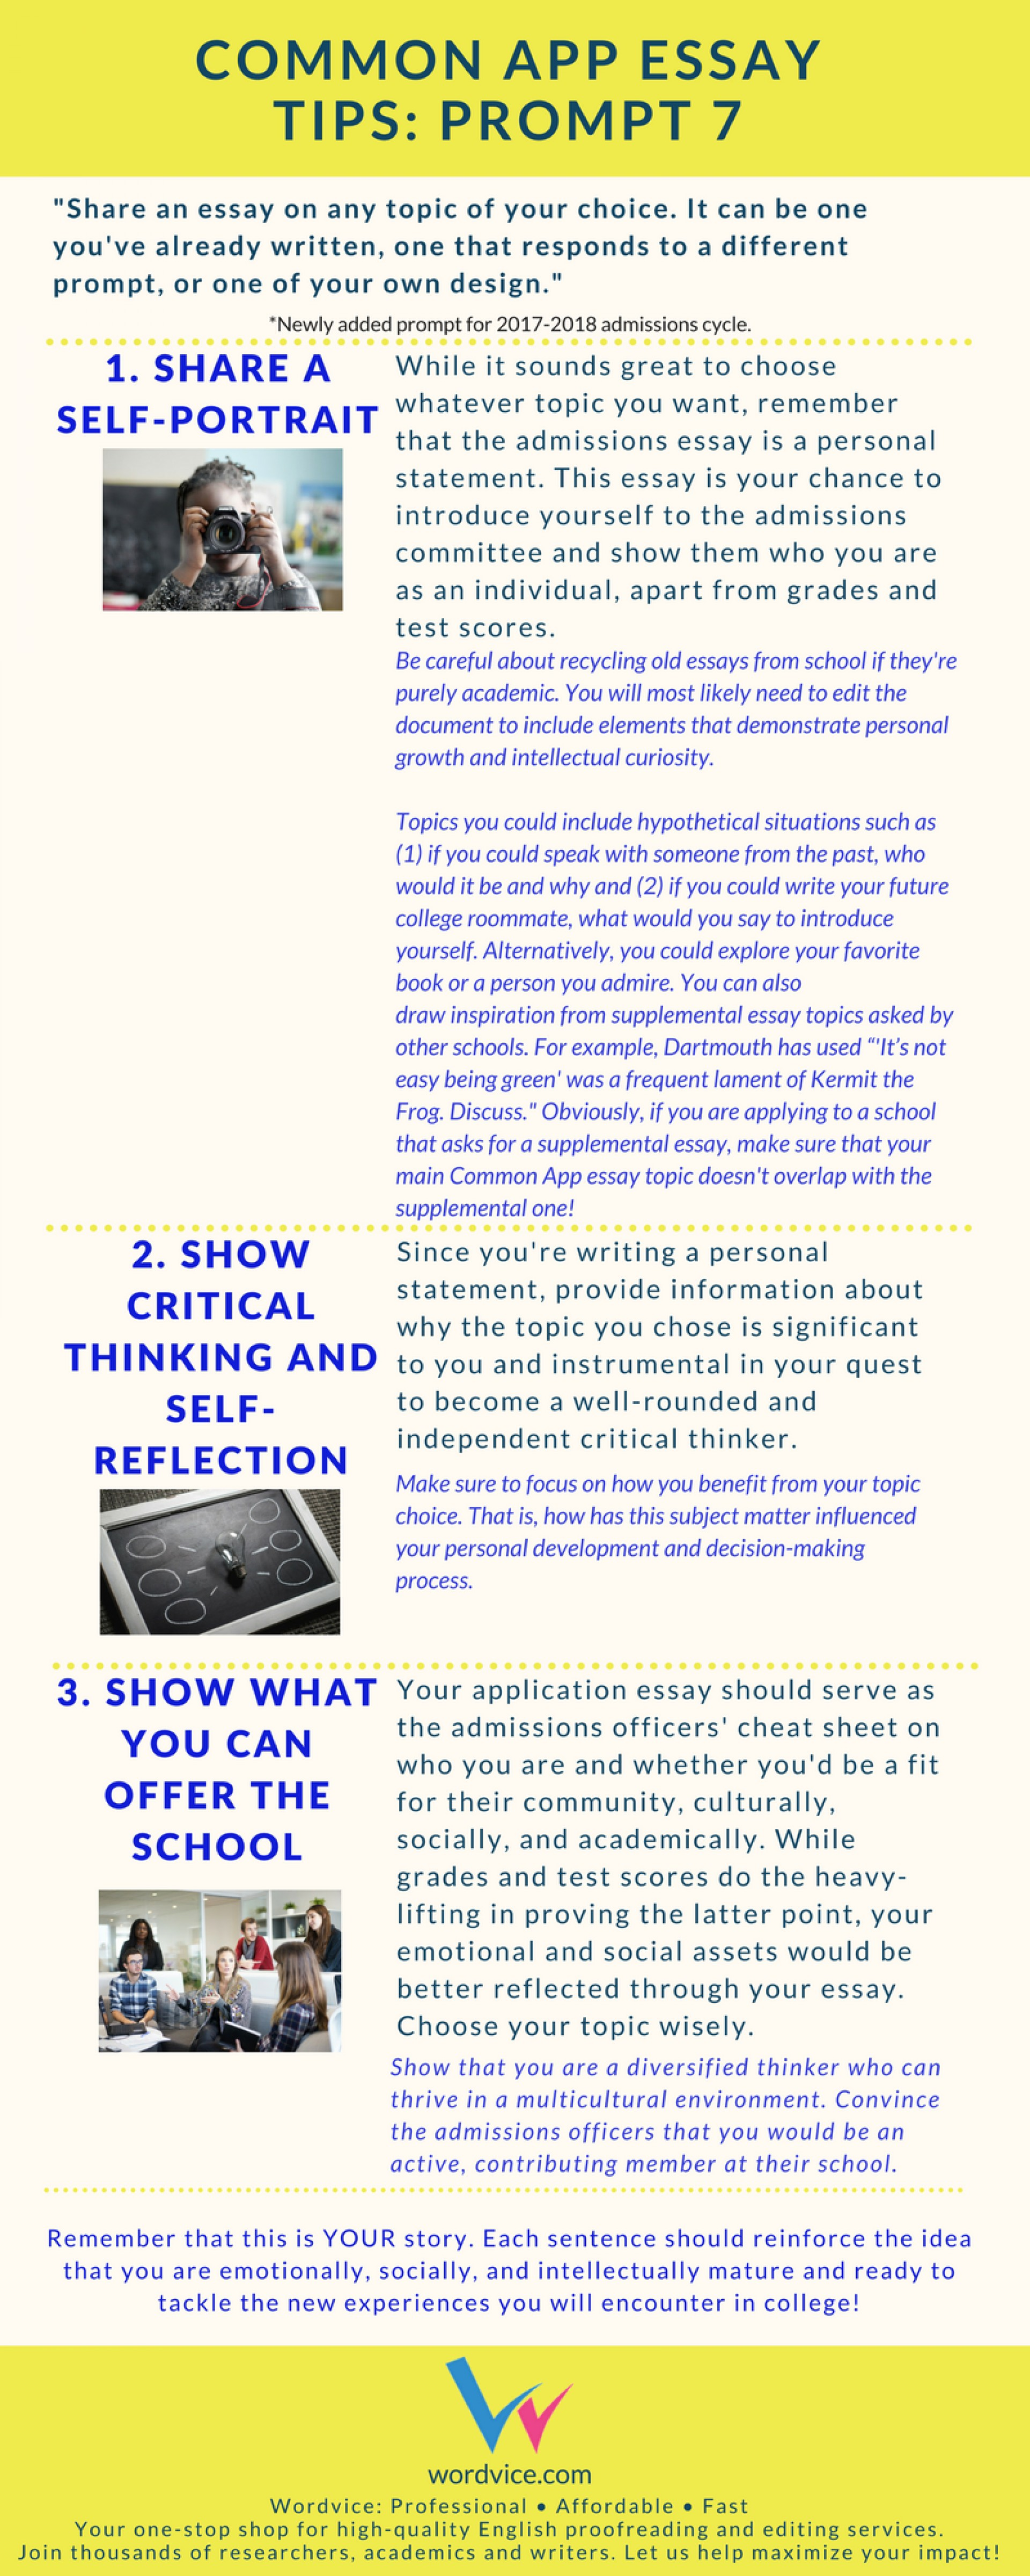 008 Common App Brainstormprompt Essay Example Unusual Prompt Examples 6 1 Sample 1920